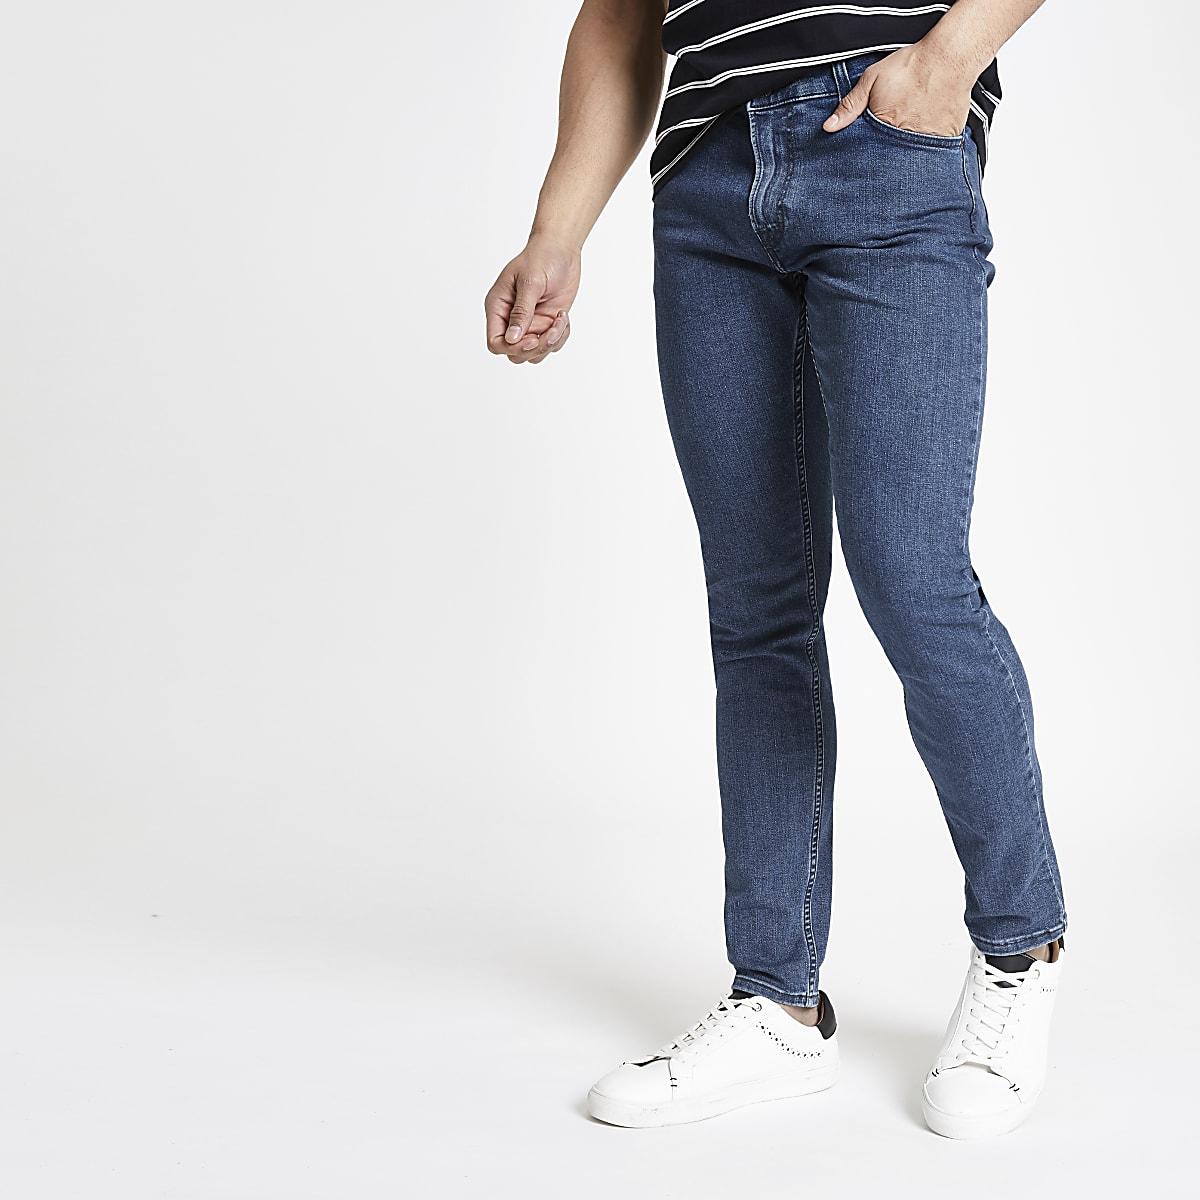 Lee – Malone – Dunkelblaue Skinny Fit Jeans